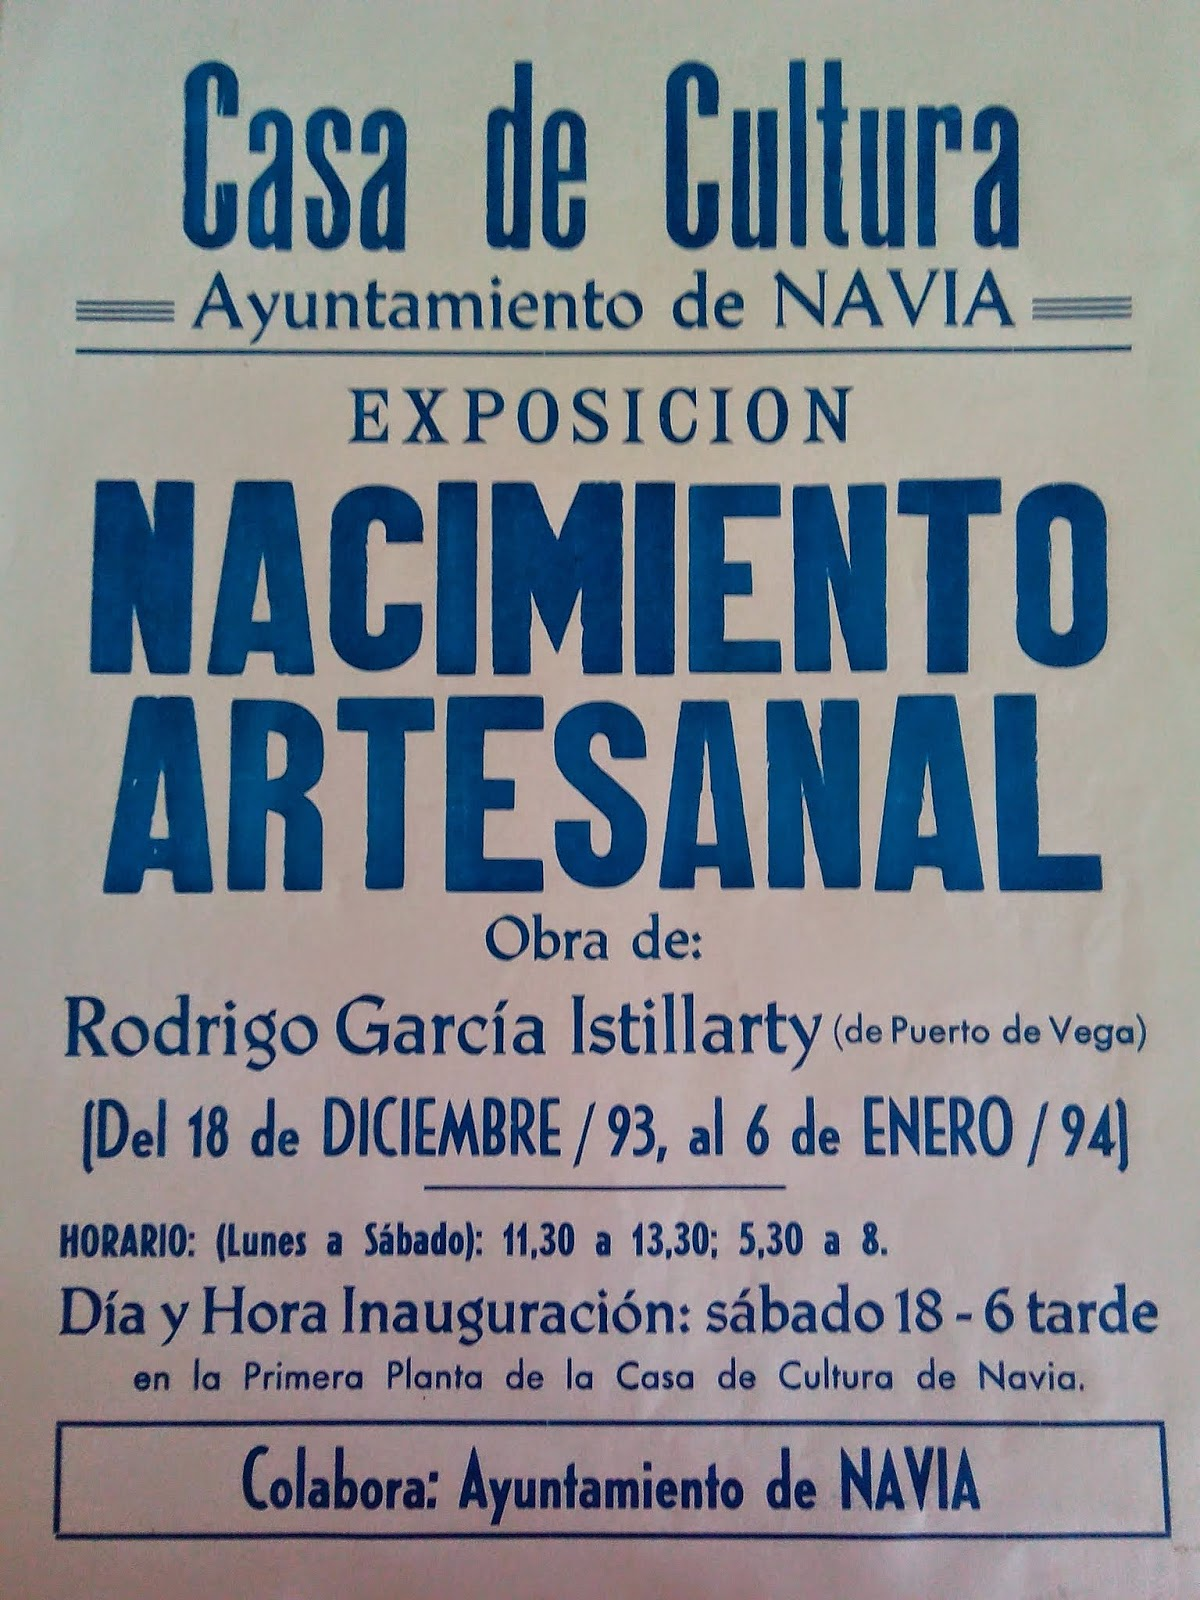 exposicion belen artesanal rodrigo garcia istillarty